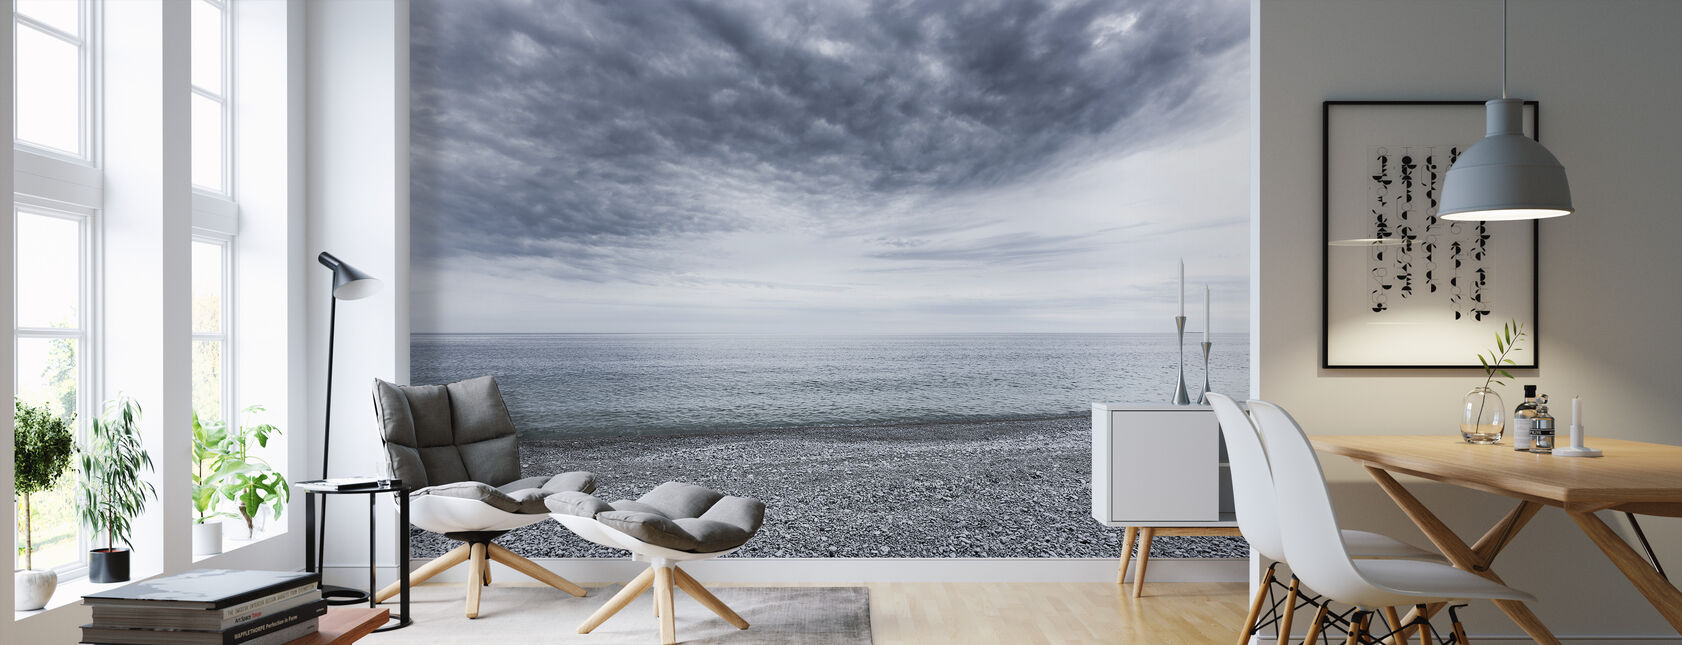 Mystery Sea - Wallpaper - Living Room